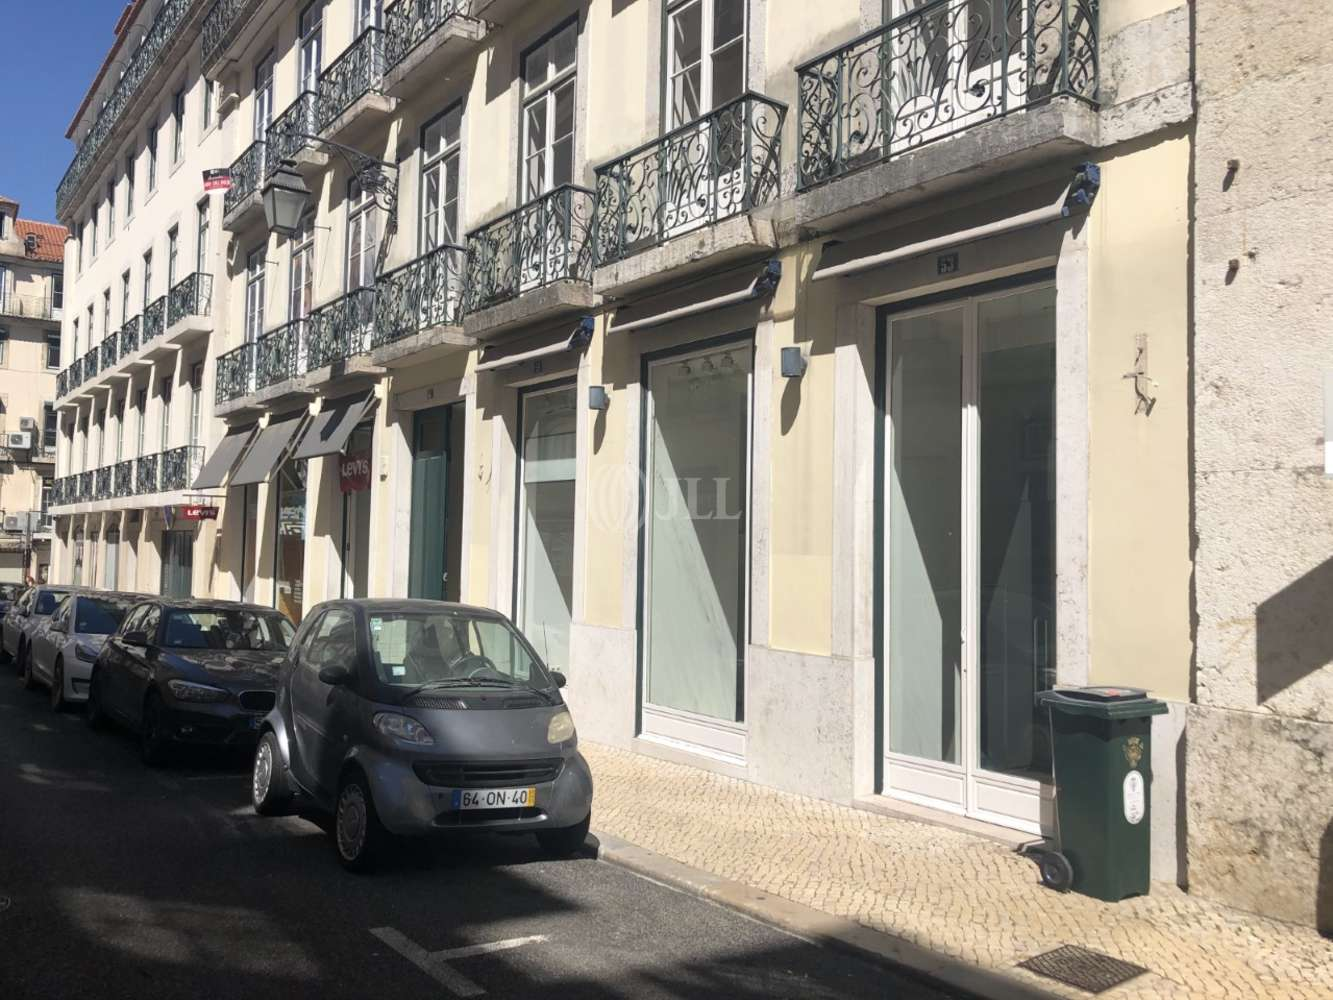 Loja Lisboa,  - Loja na Rua Ivens, Chiado